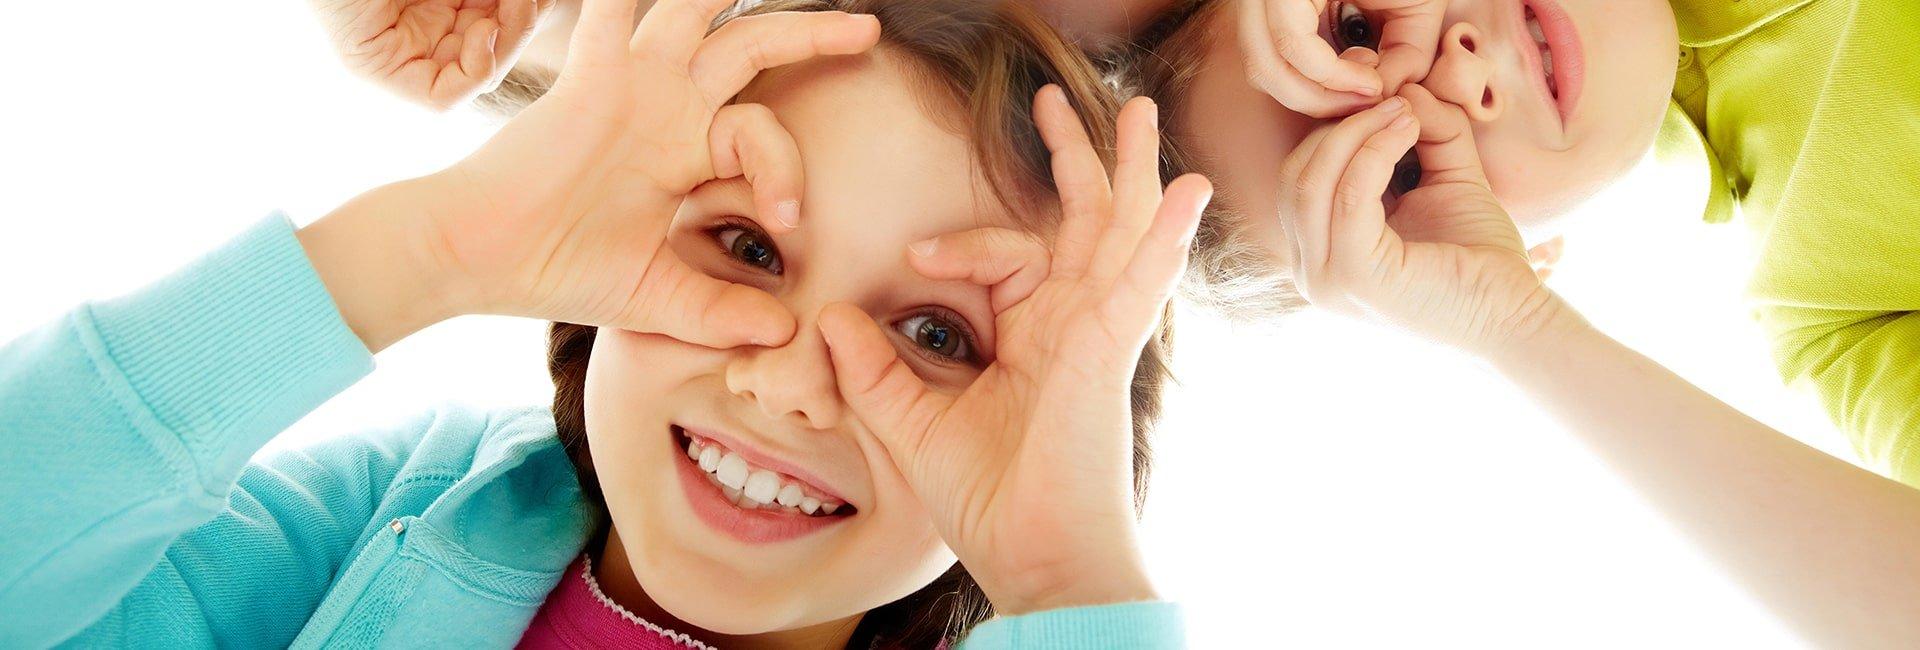 Kalamazoo Pediatric Dentistry